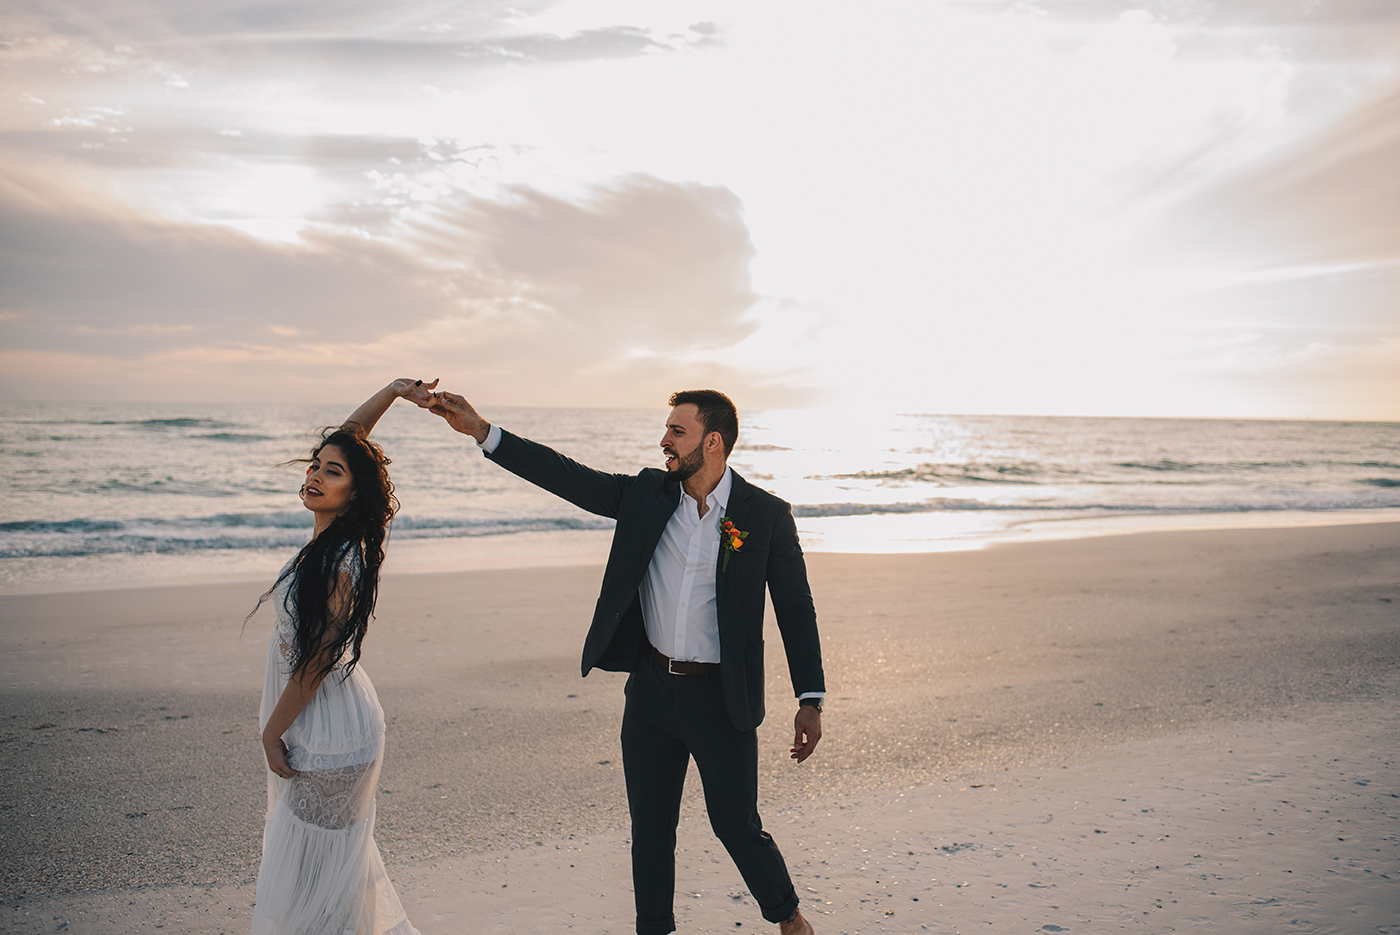 Los-Vargas-Photo-Moana-Wedding-Style-shoot-73.jpg